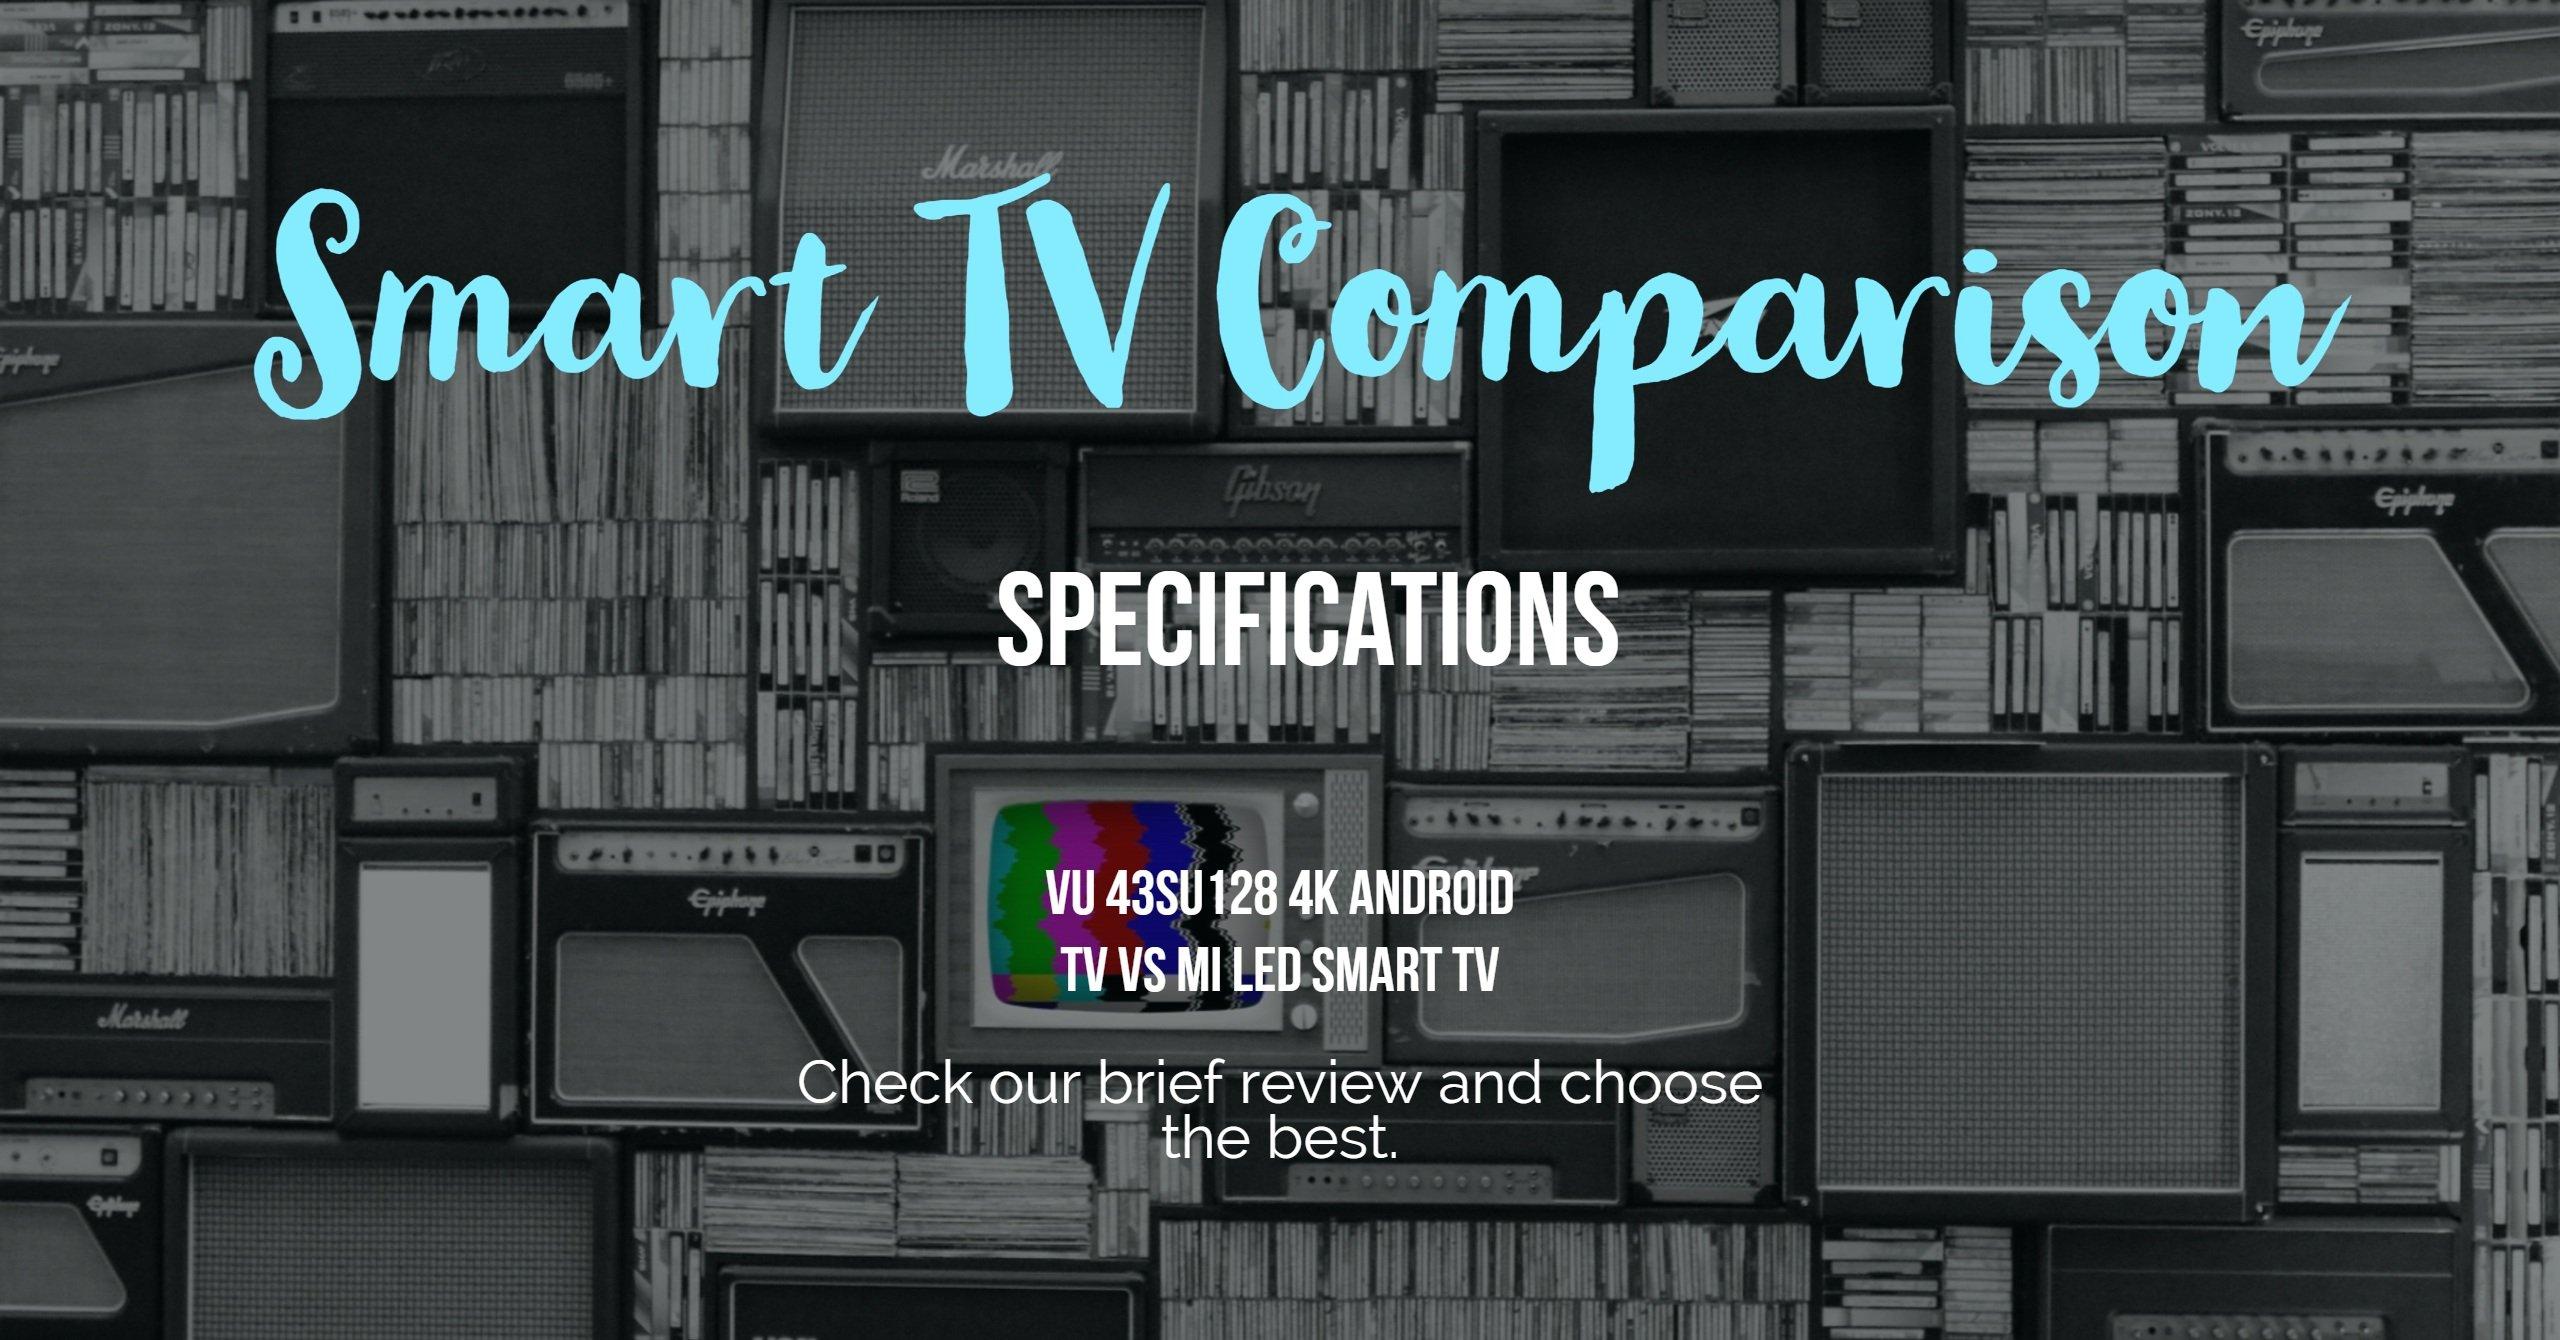 VU 43SU128 4K ANDROID TV Vs MI LED Smart TV